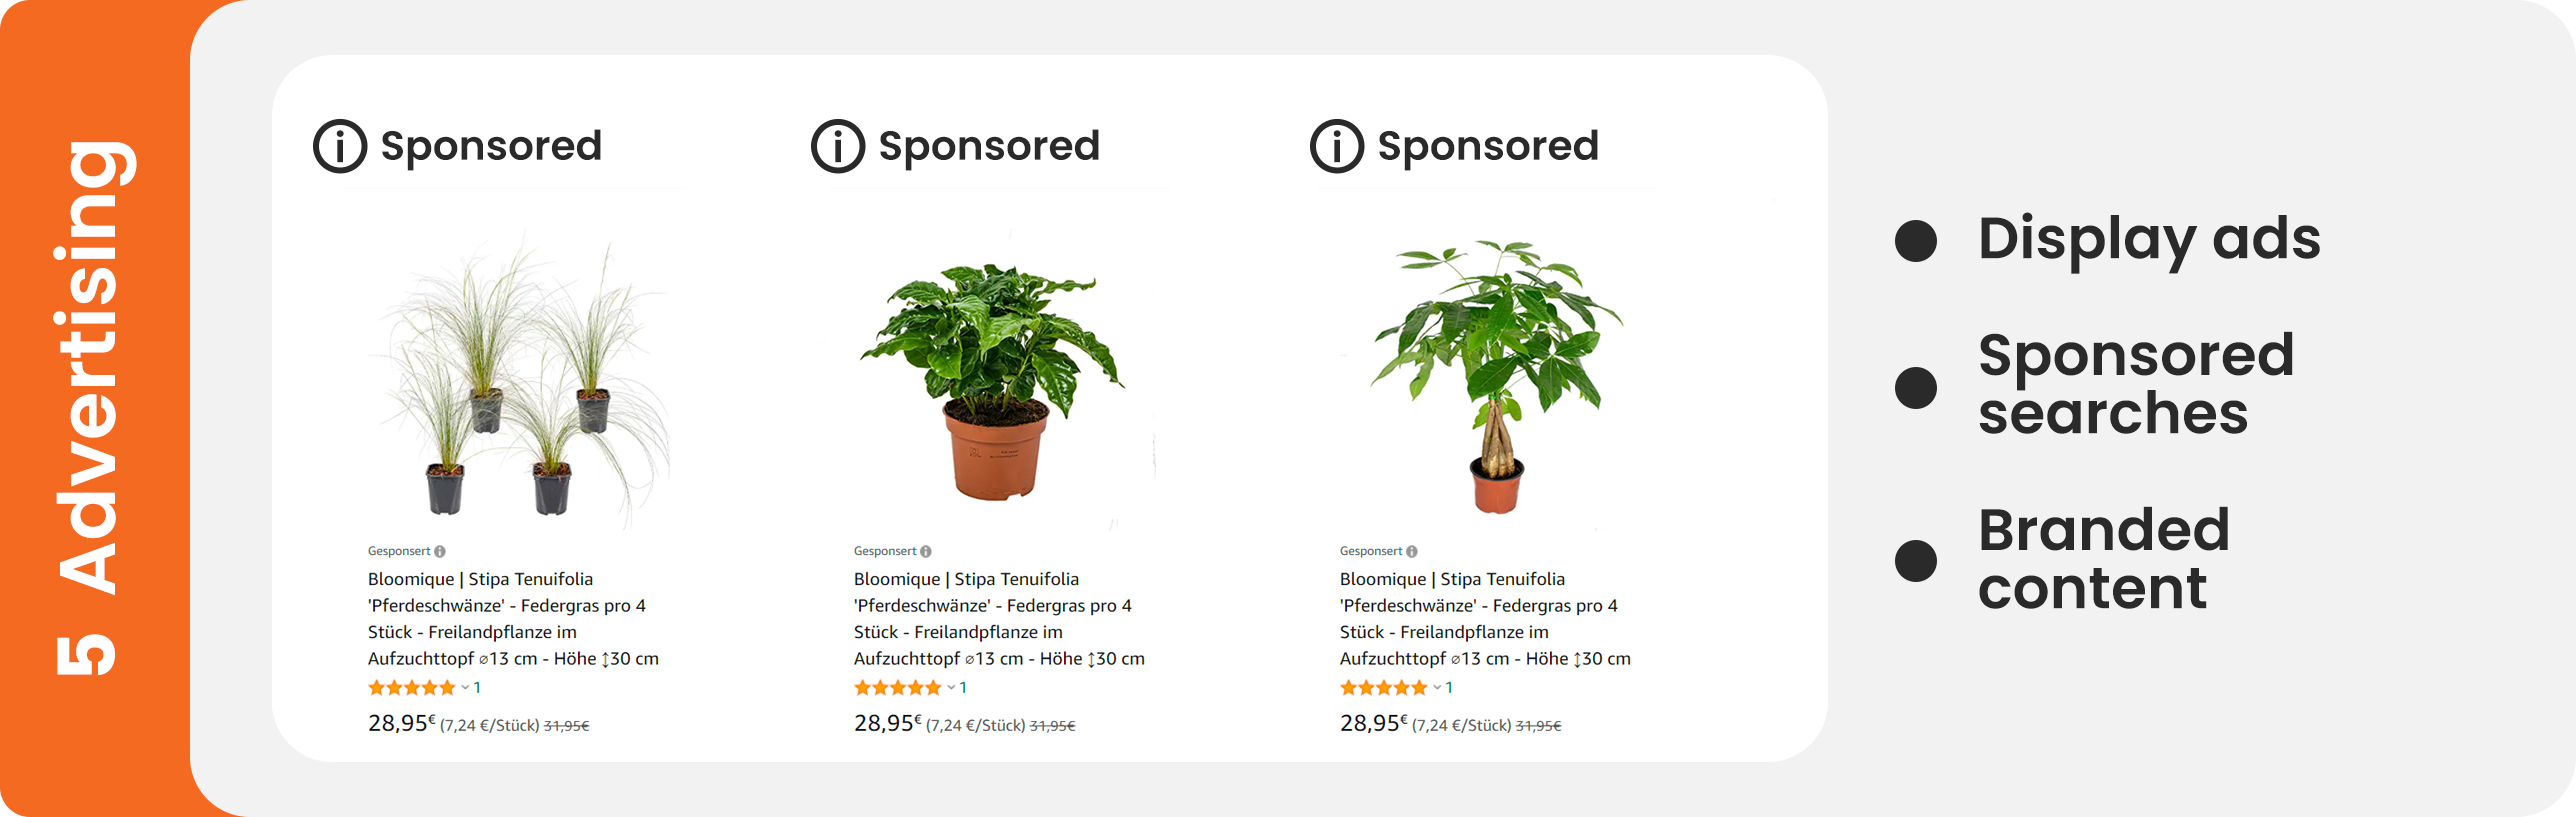 5 Advertising - Amazon [EN]